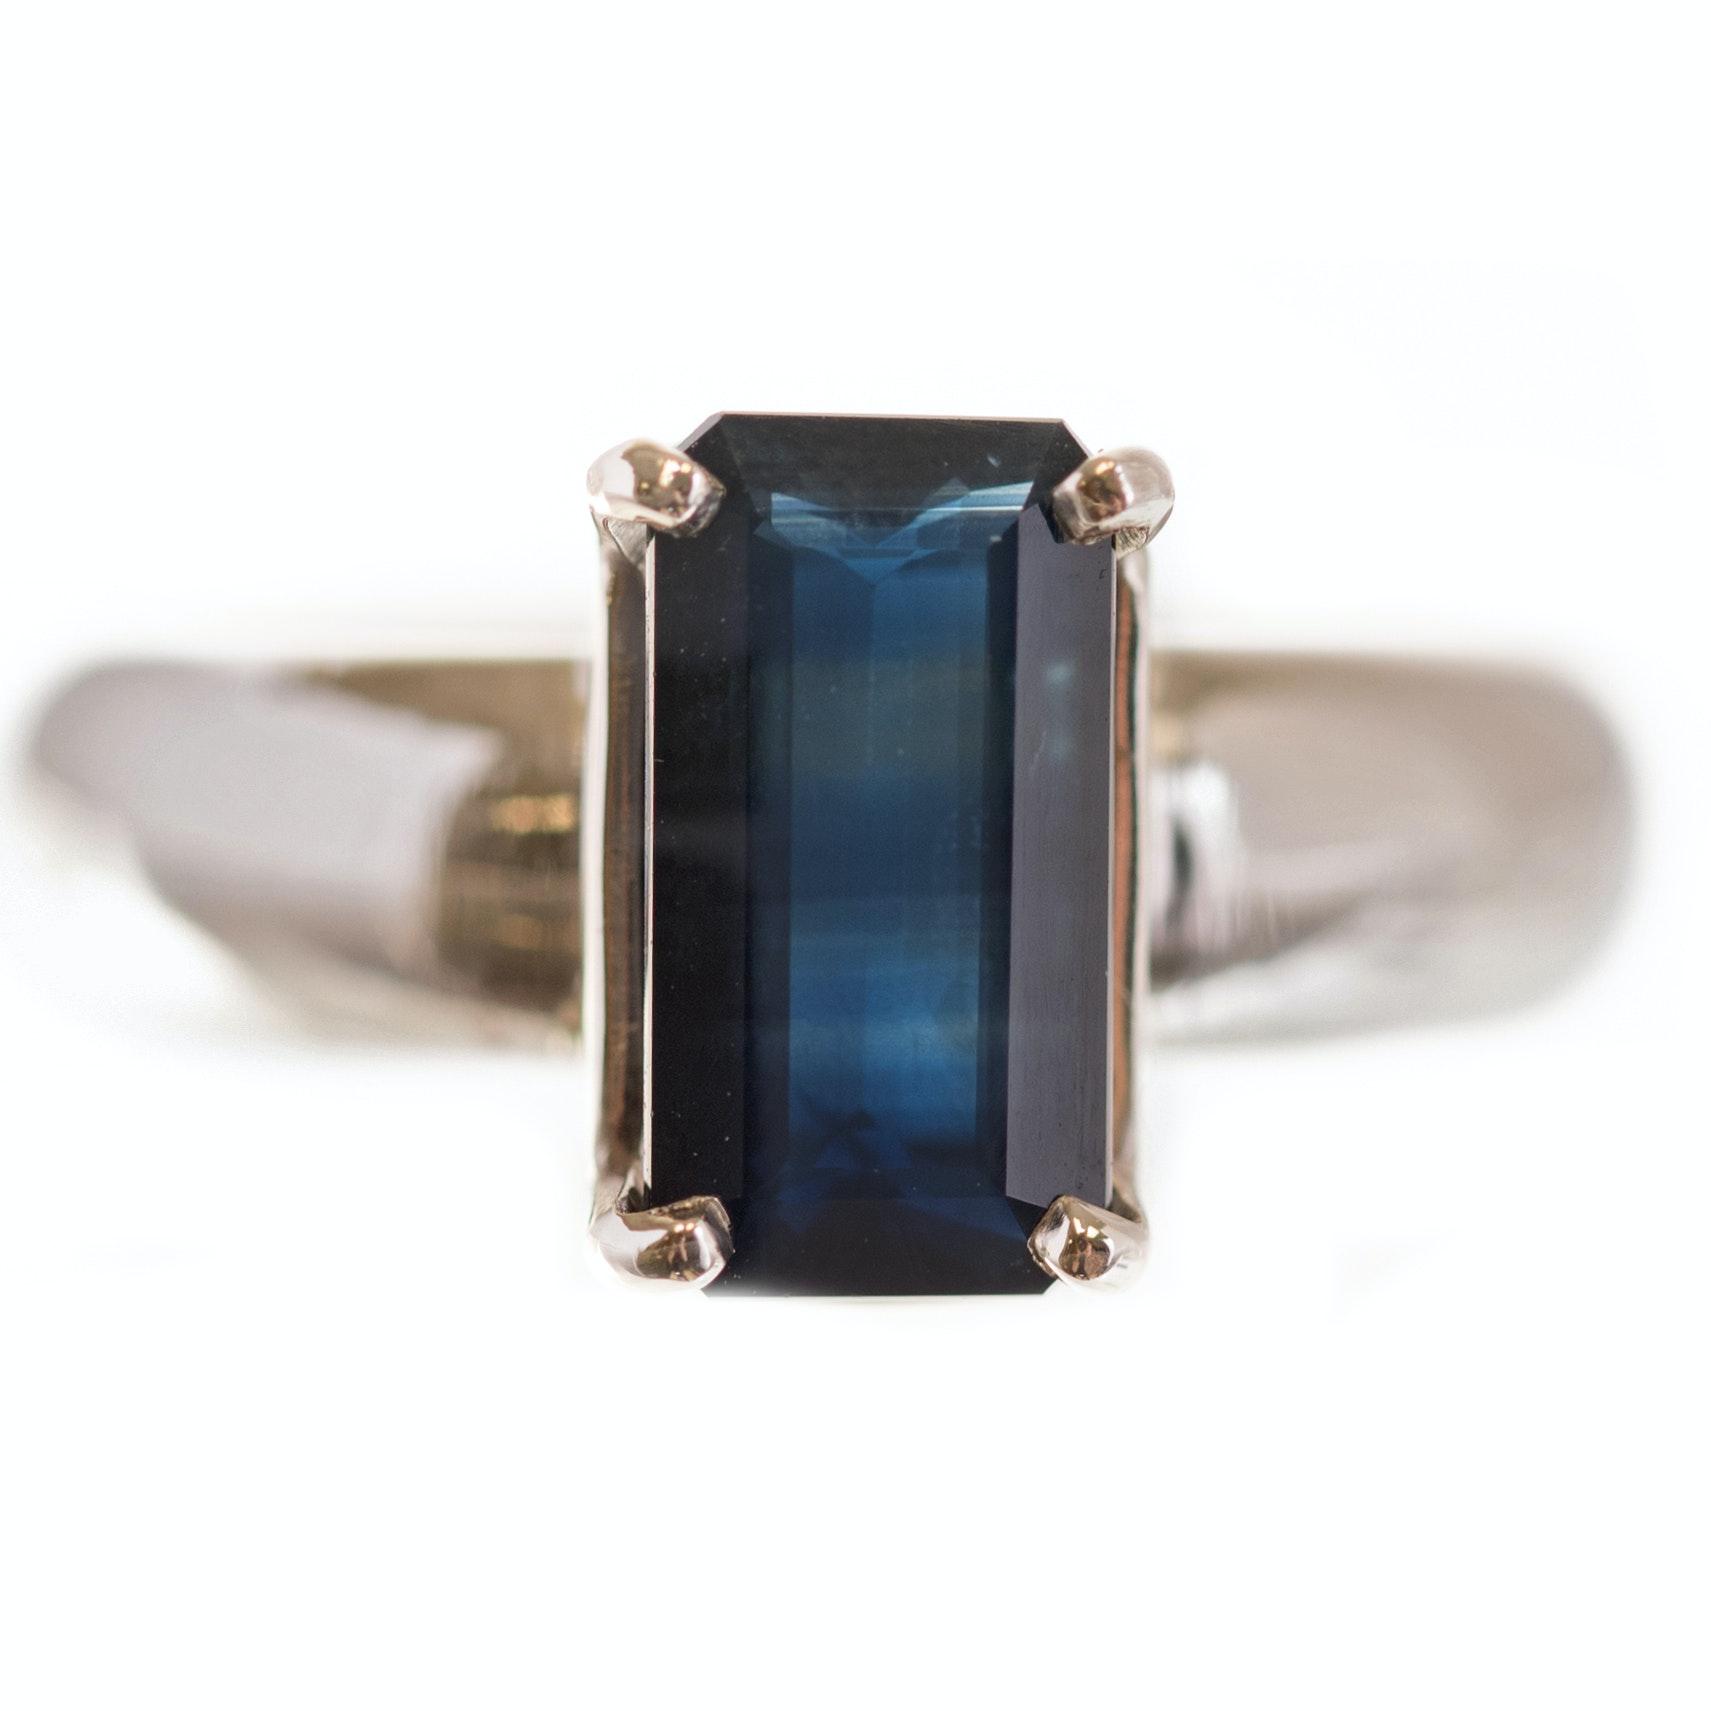 14K White Gold 2.07 CT Sapphire Ring